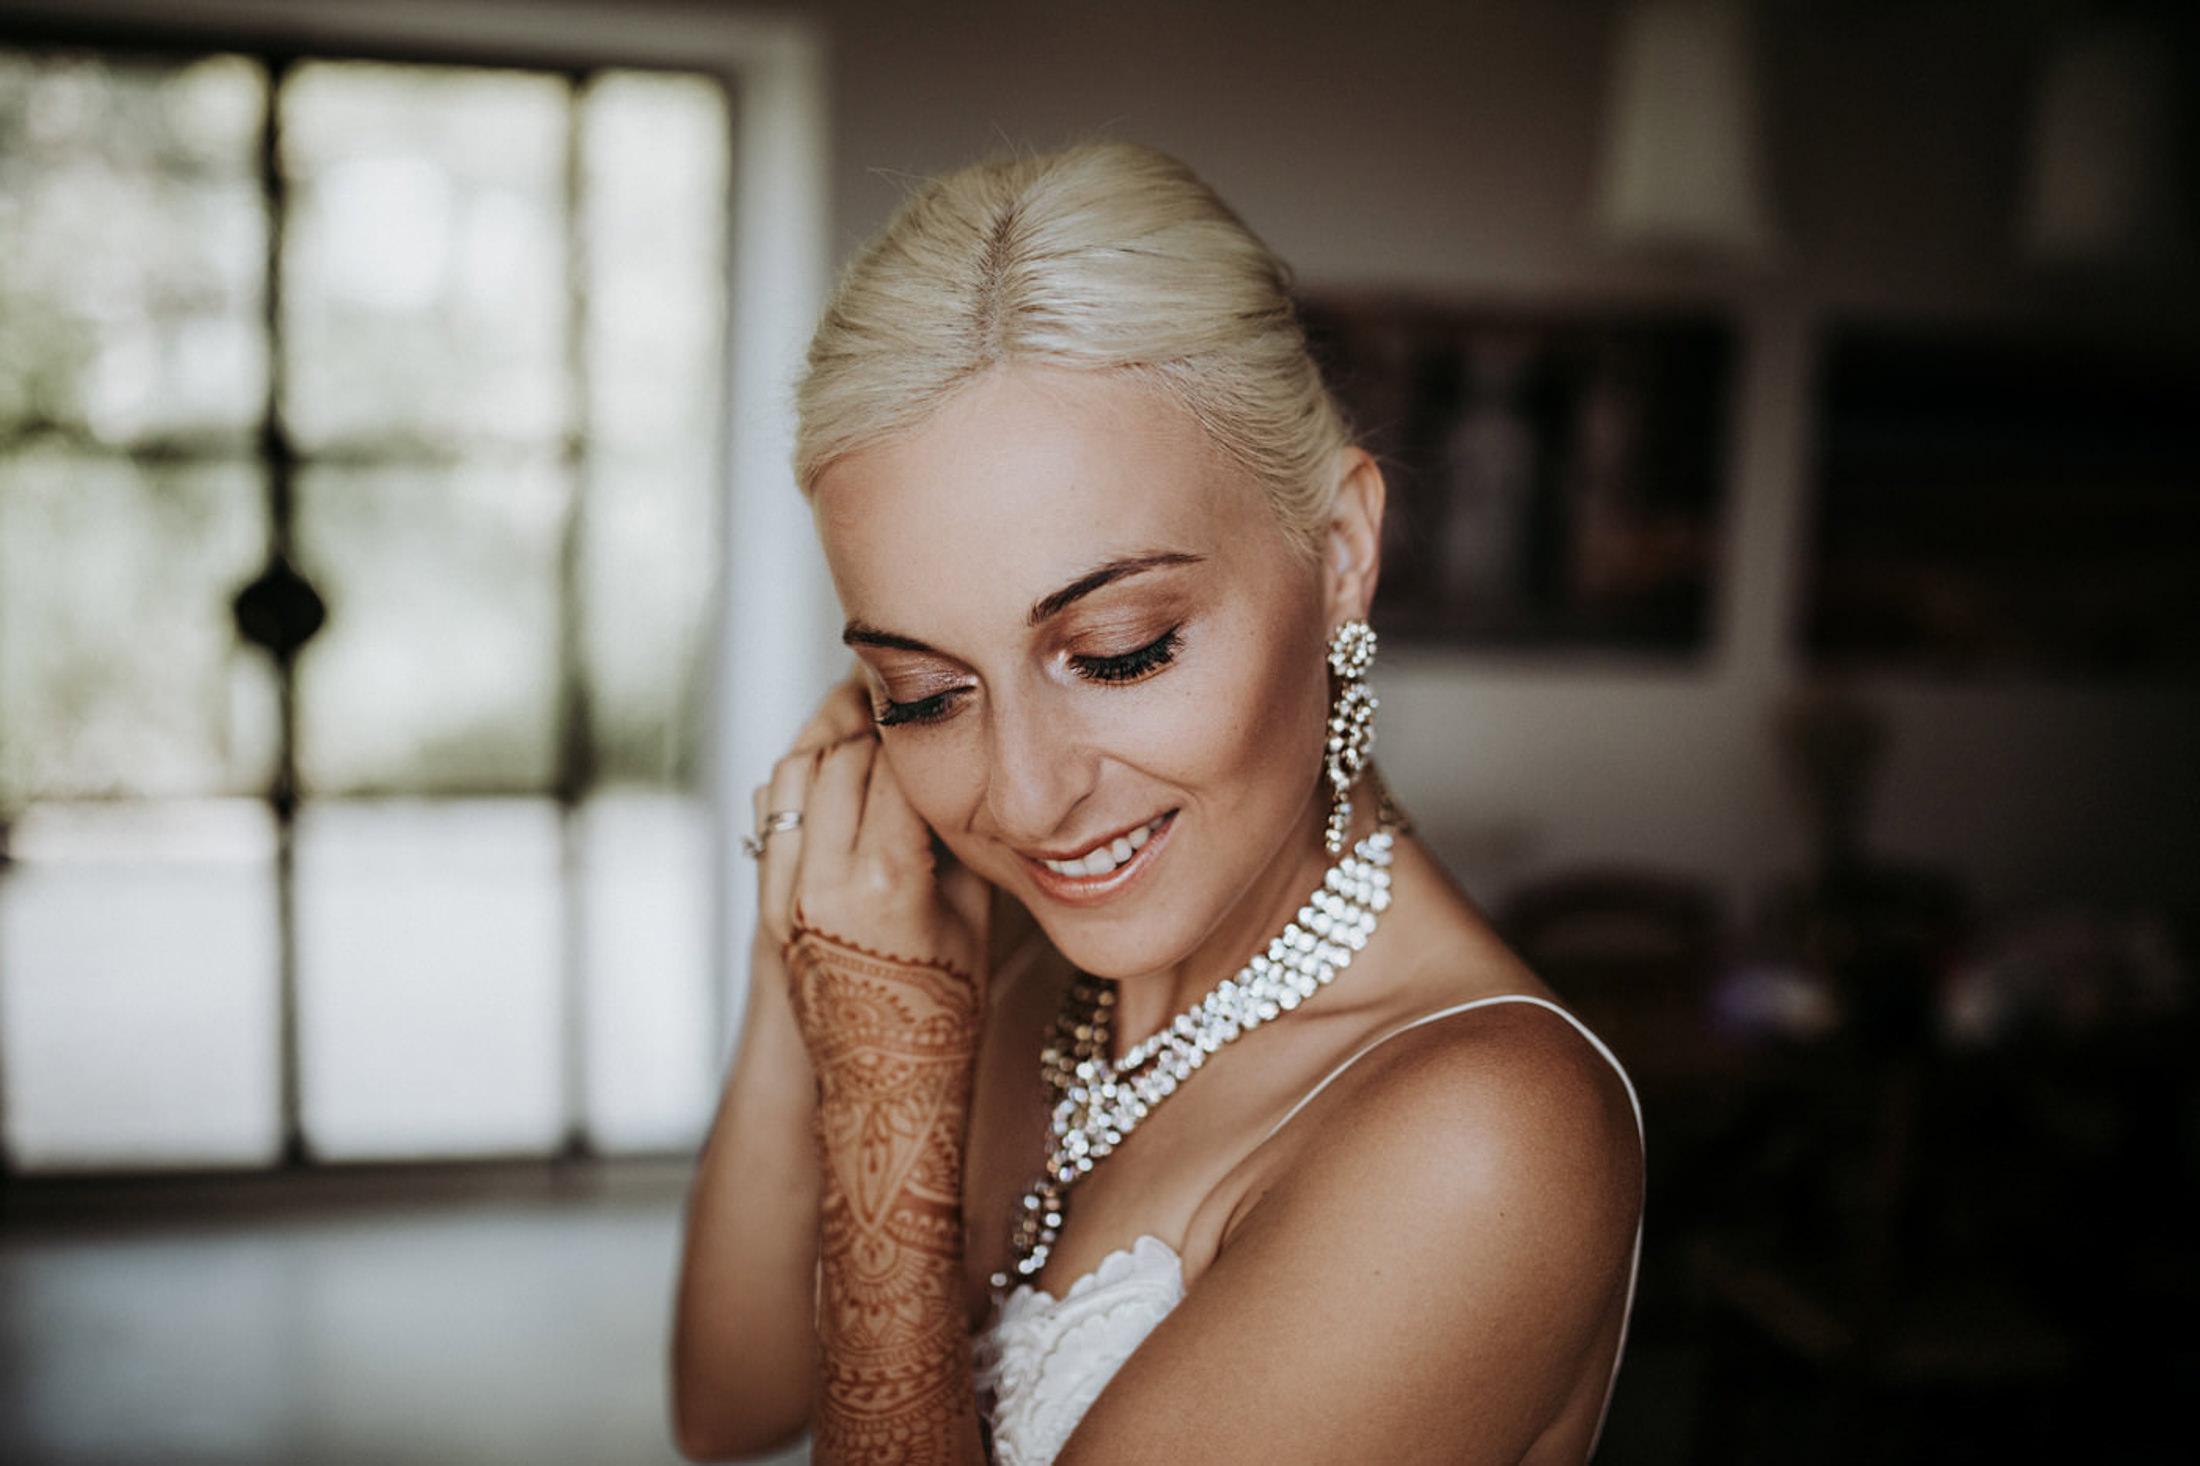 Wedding_Photographer_Mallorca_Daniela-Marquardt_Photography_New_York_Iceland_Tuscany_Santorini_Portugal_Austria_Bavaria_Elopement_Hochzeitsfotograf_AntjeRajat2_76